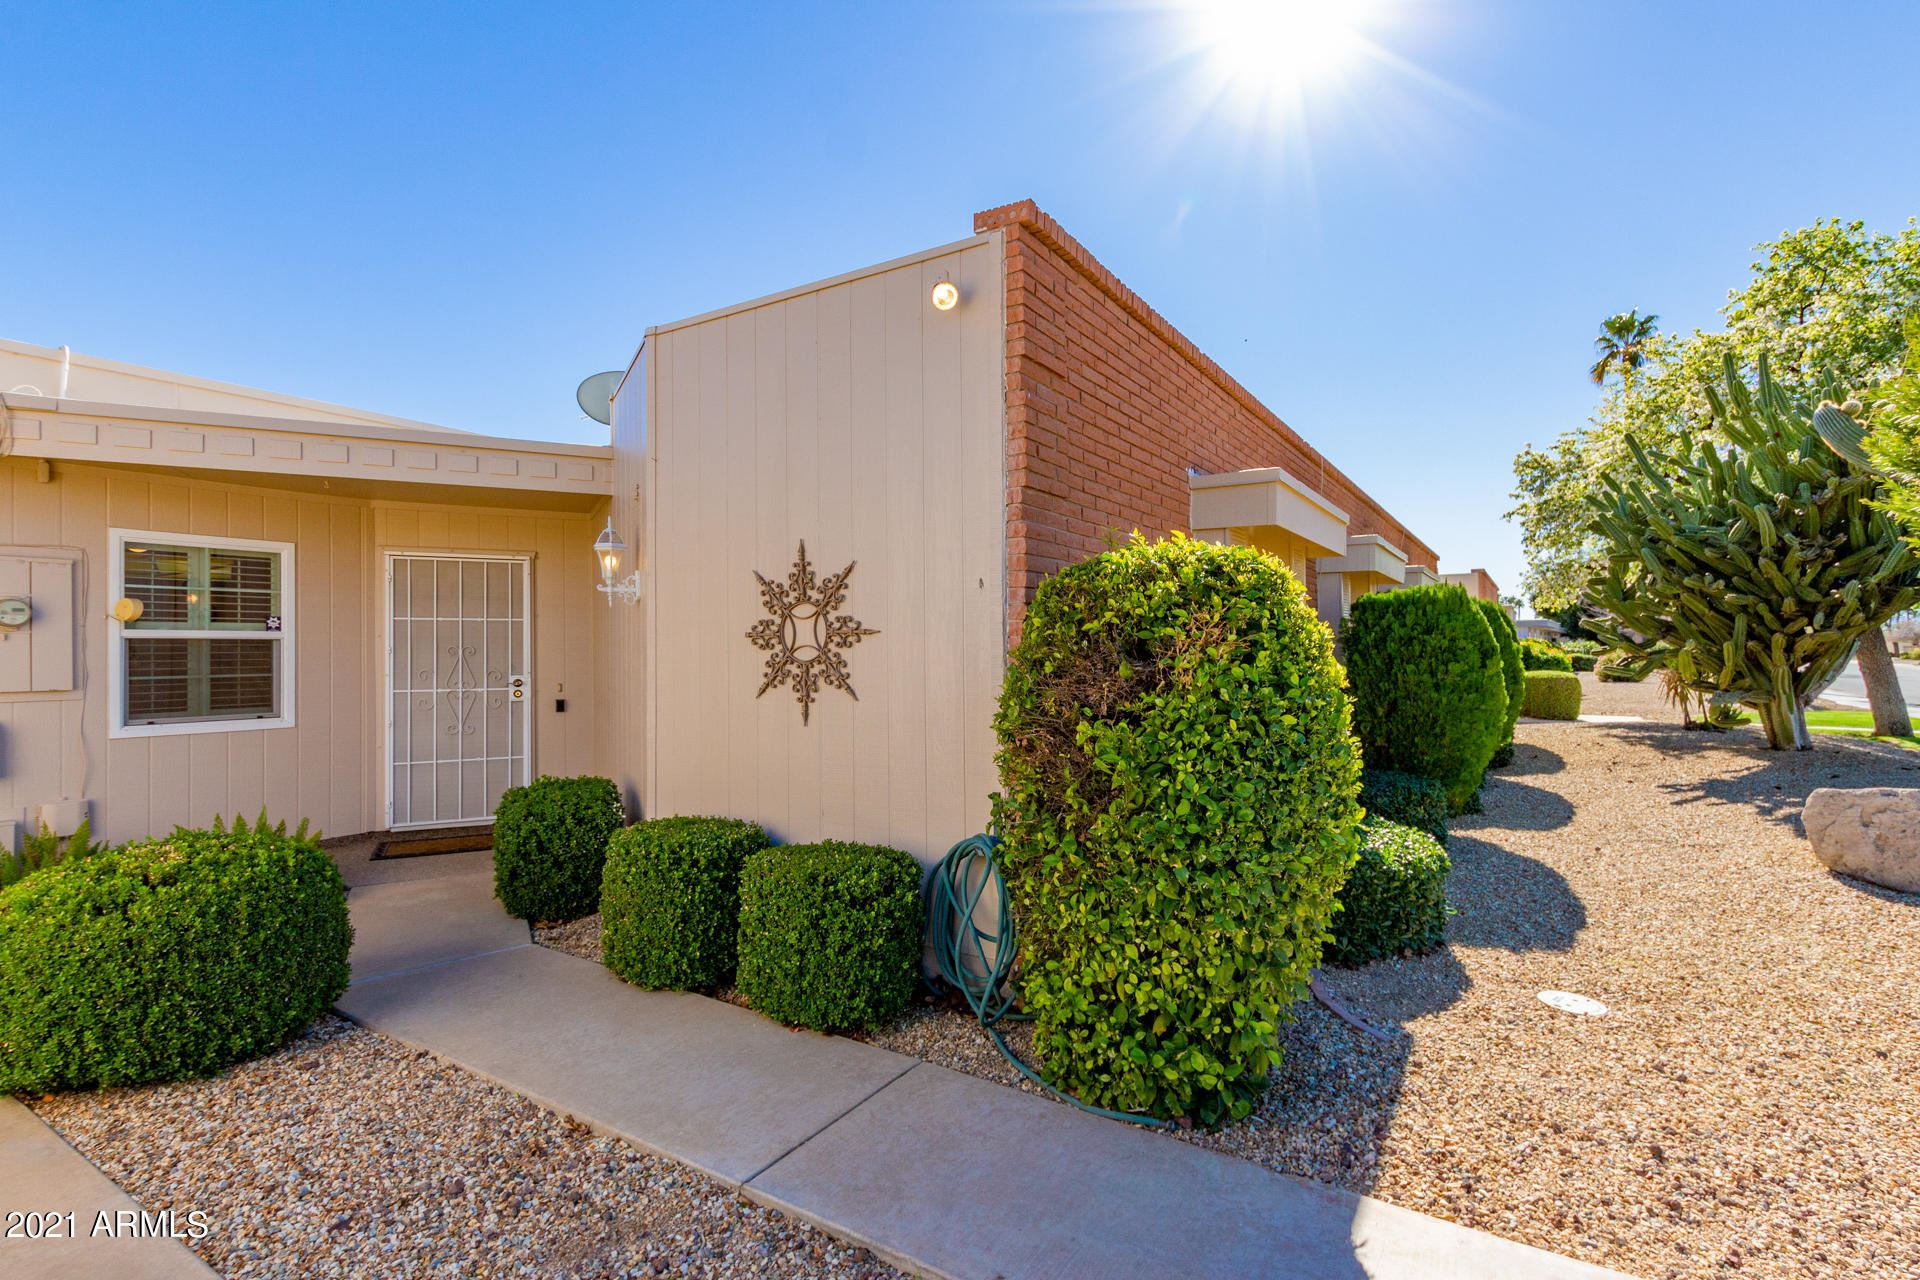 Photo of 10513 W OCOTILLO Drive, Sun City, AZ 85373 (MLS # 6200349)